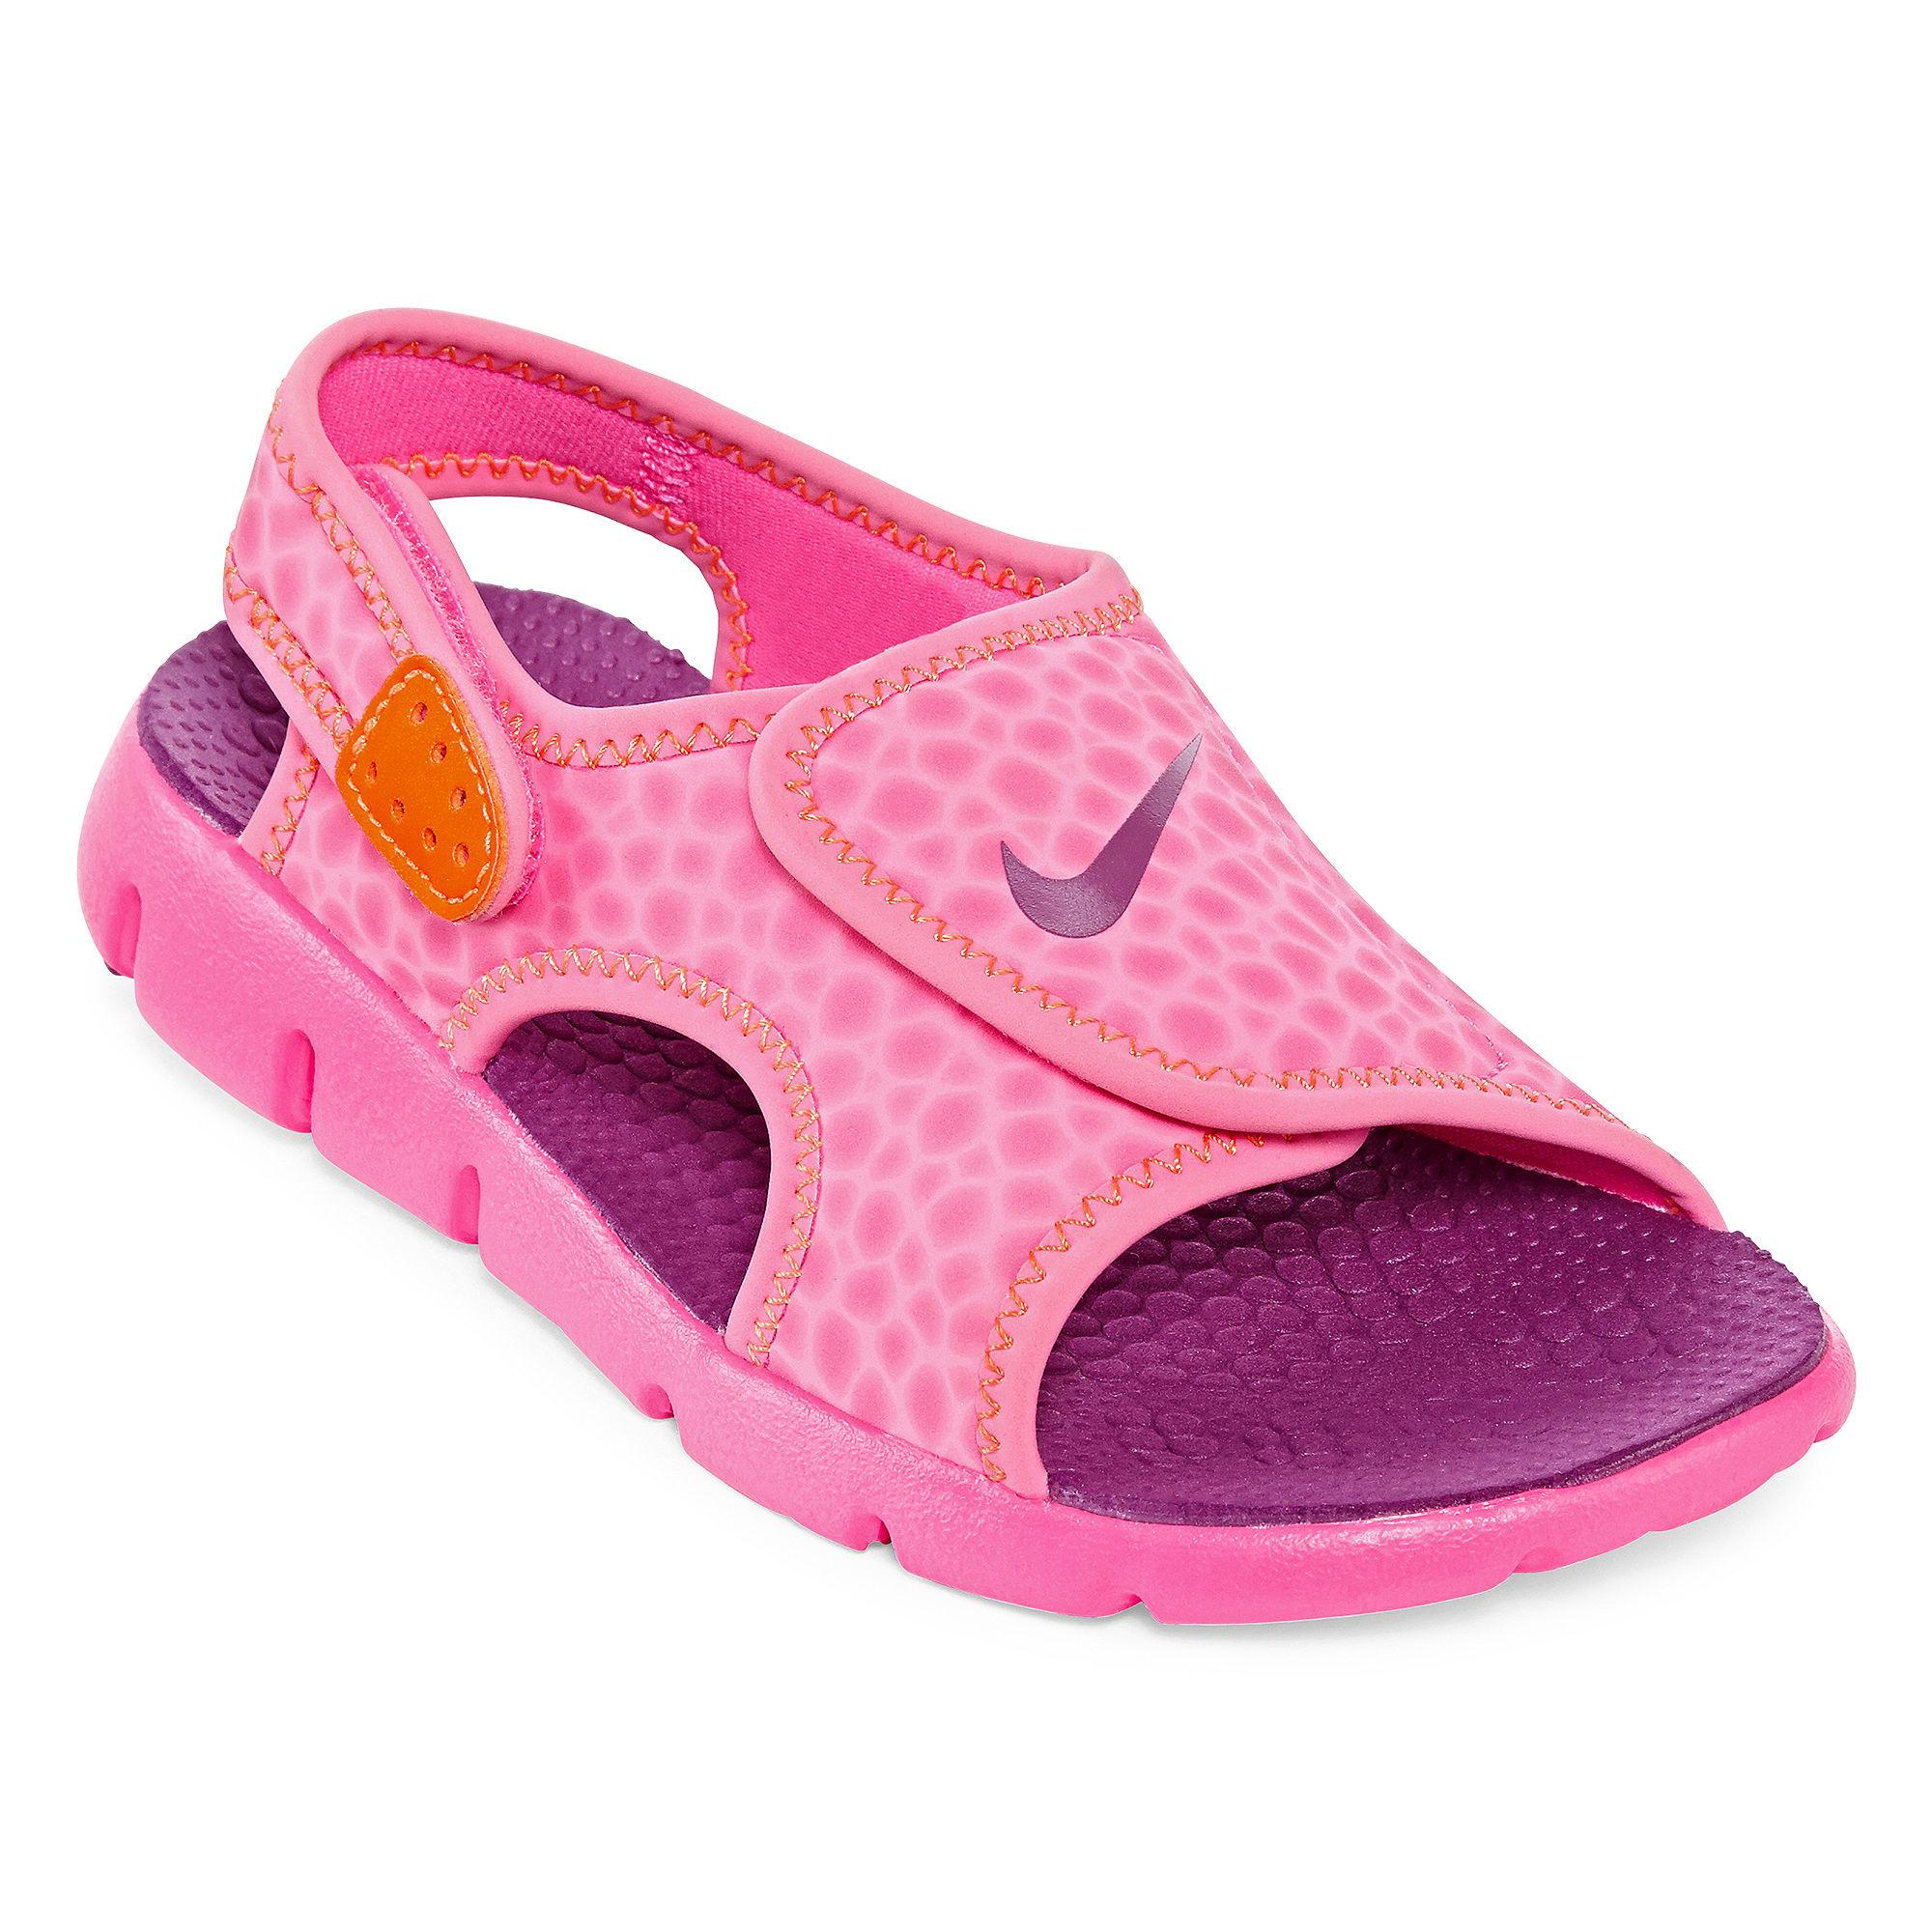 3d60c6008ff8 ... Finish UPC 685068728495 product image for Nike Sunray Adjustable Girls  Sandals - Little Kids